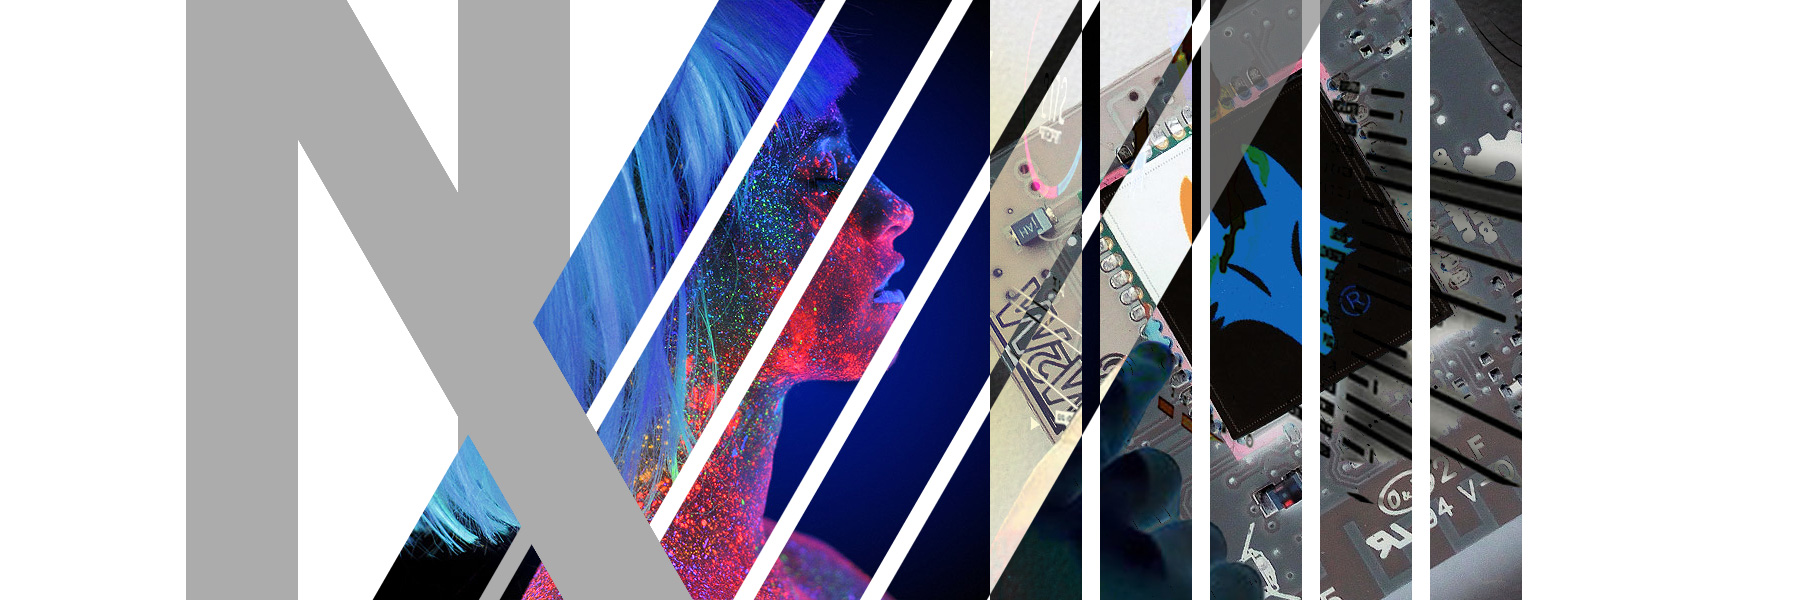 irotee-global-design-office-design-for-innovation-design-works-1